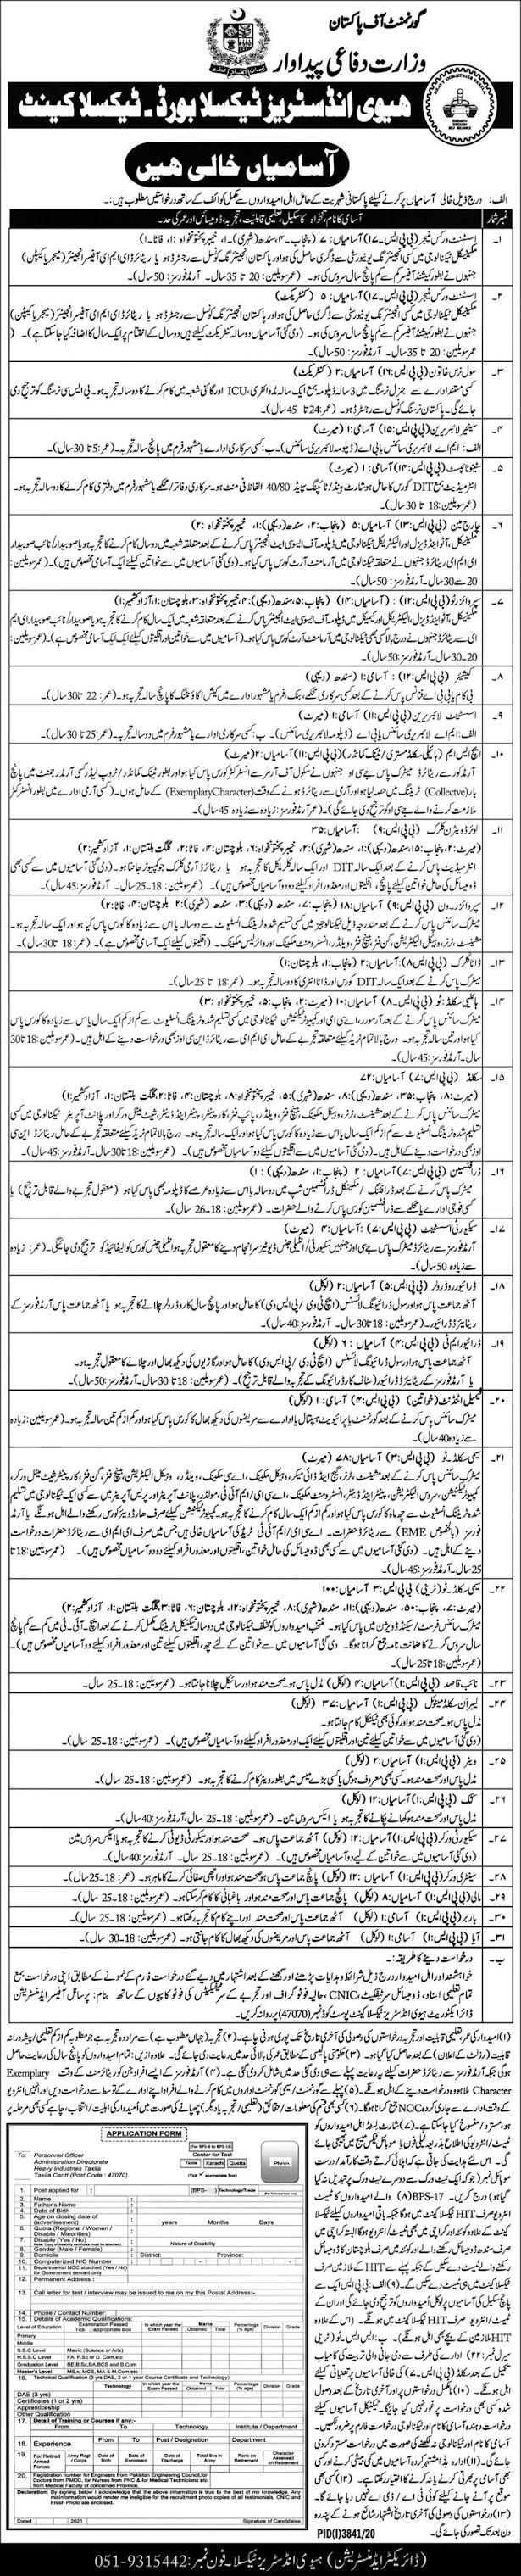 HIT in Pakistan - Jobs in heavy industry Taxila 2021 - Download Application HIT Jobs 2021 in Pakistan - Latest government jobs in 2021 in Pakistan